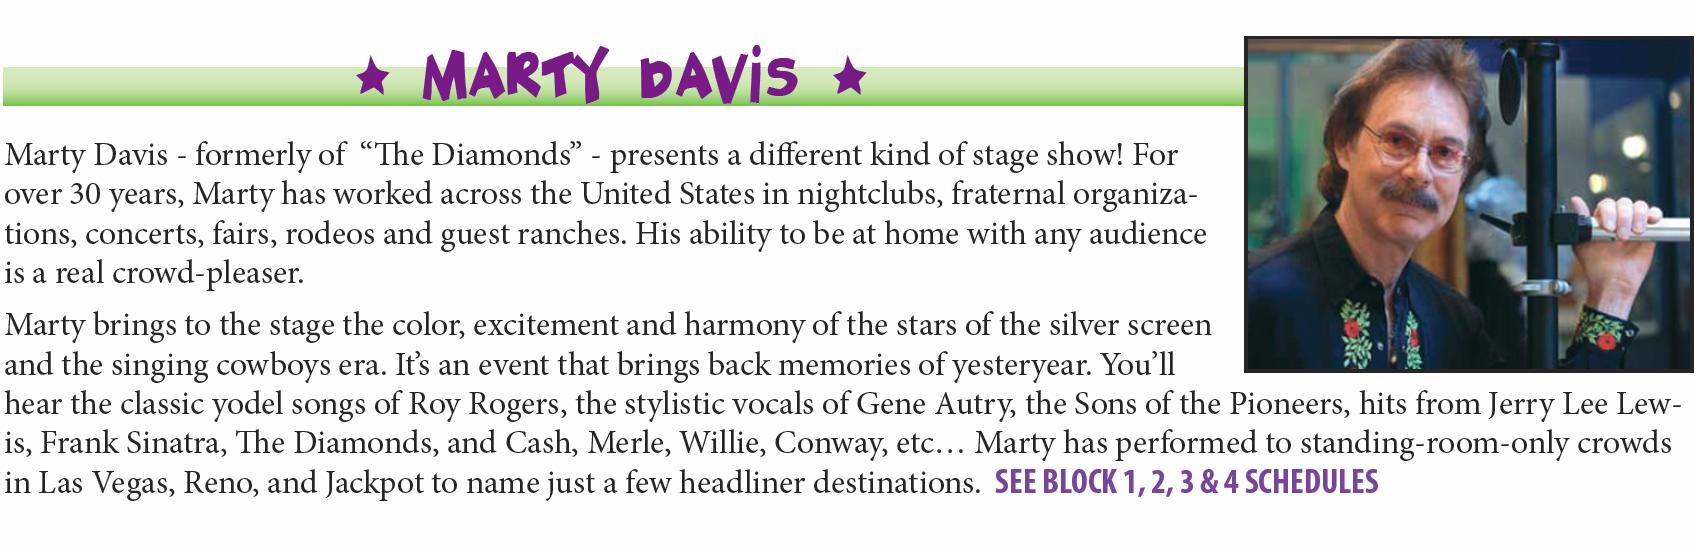 Marty Davis 2015